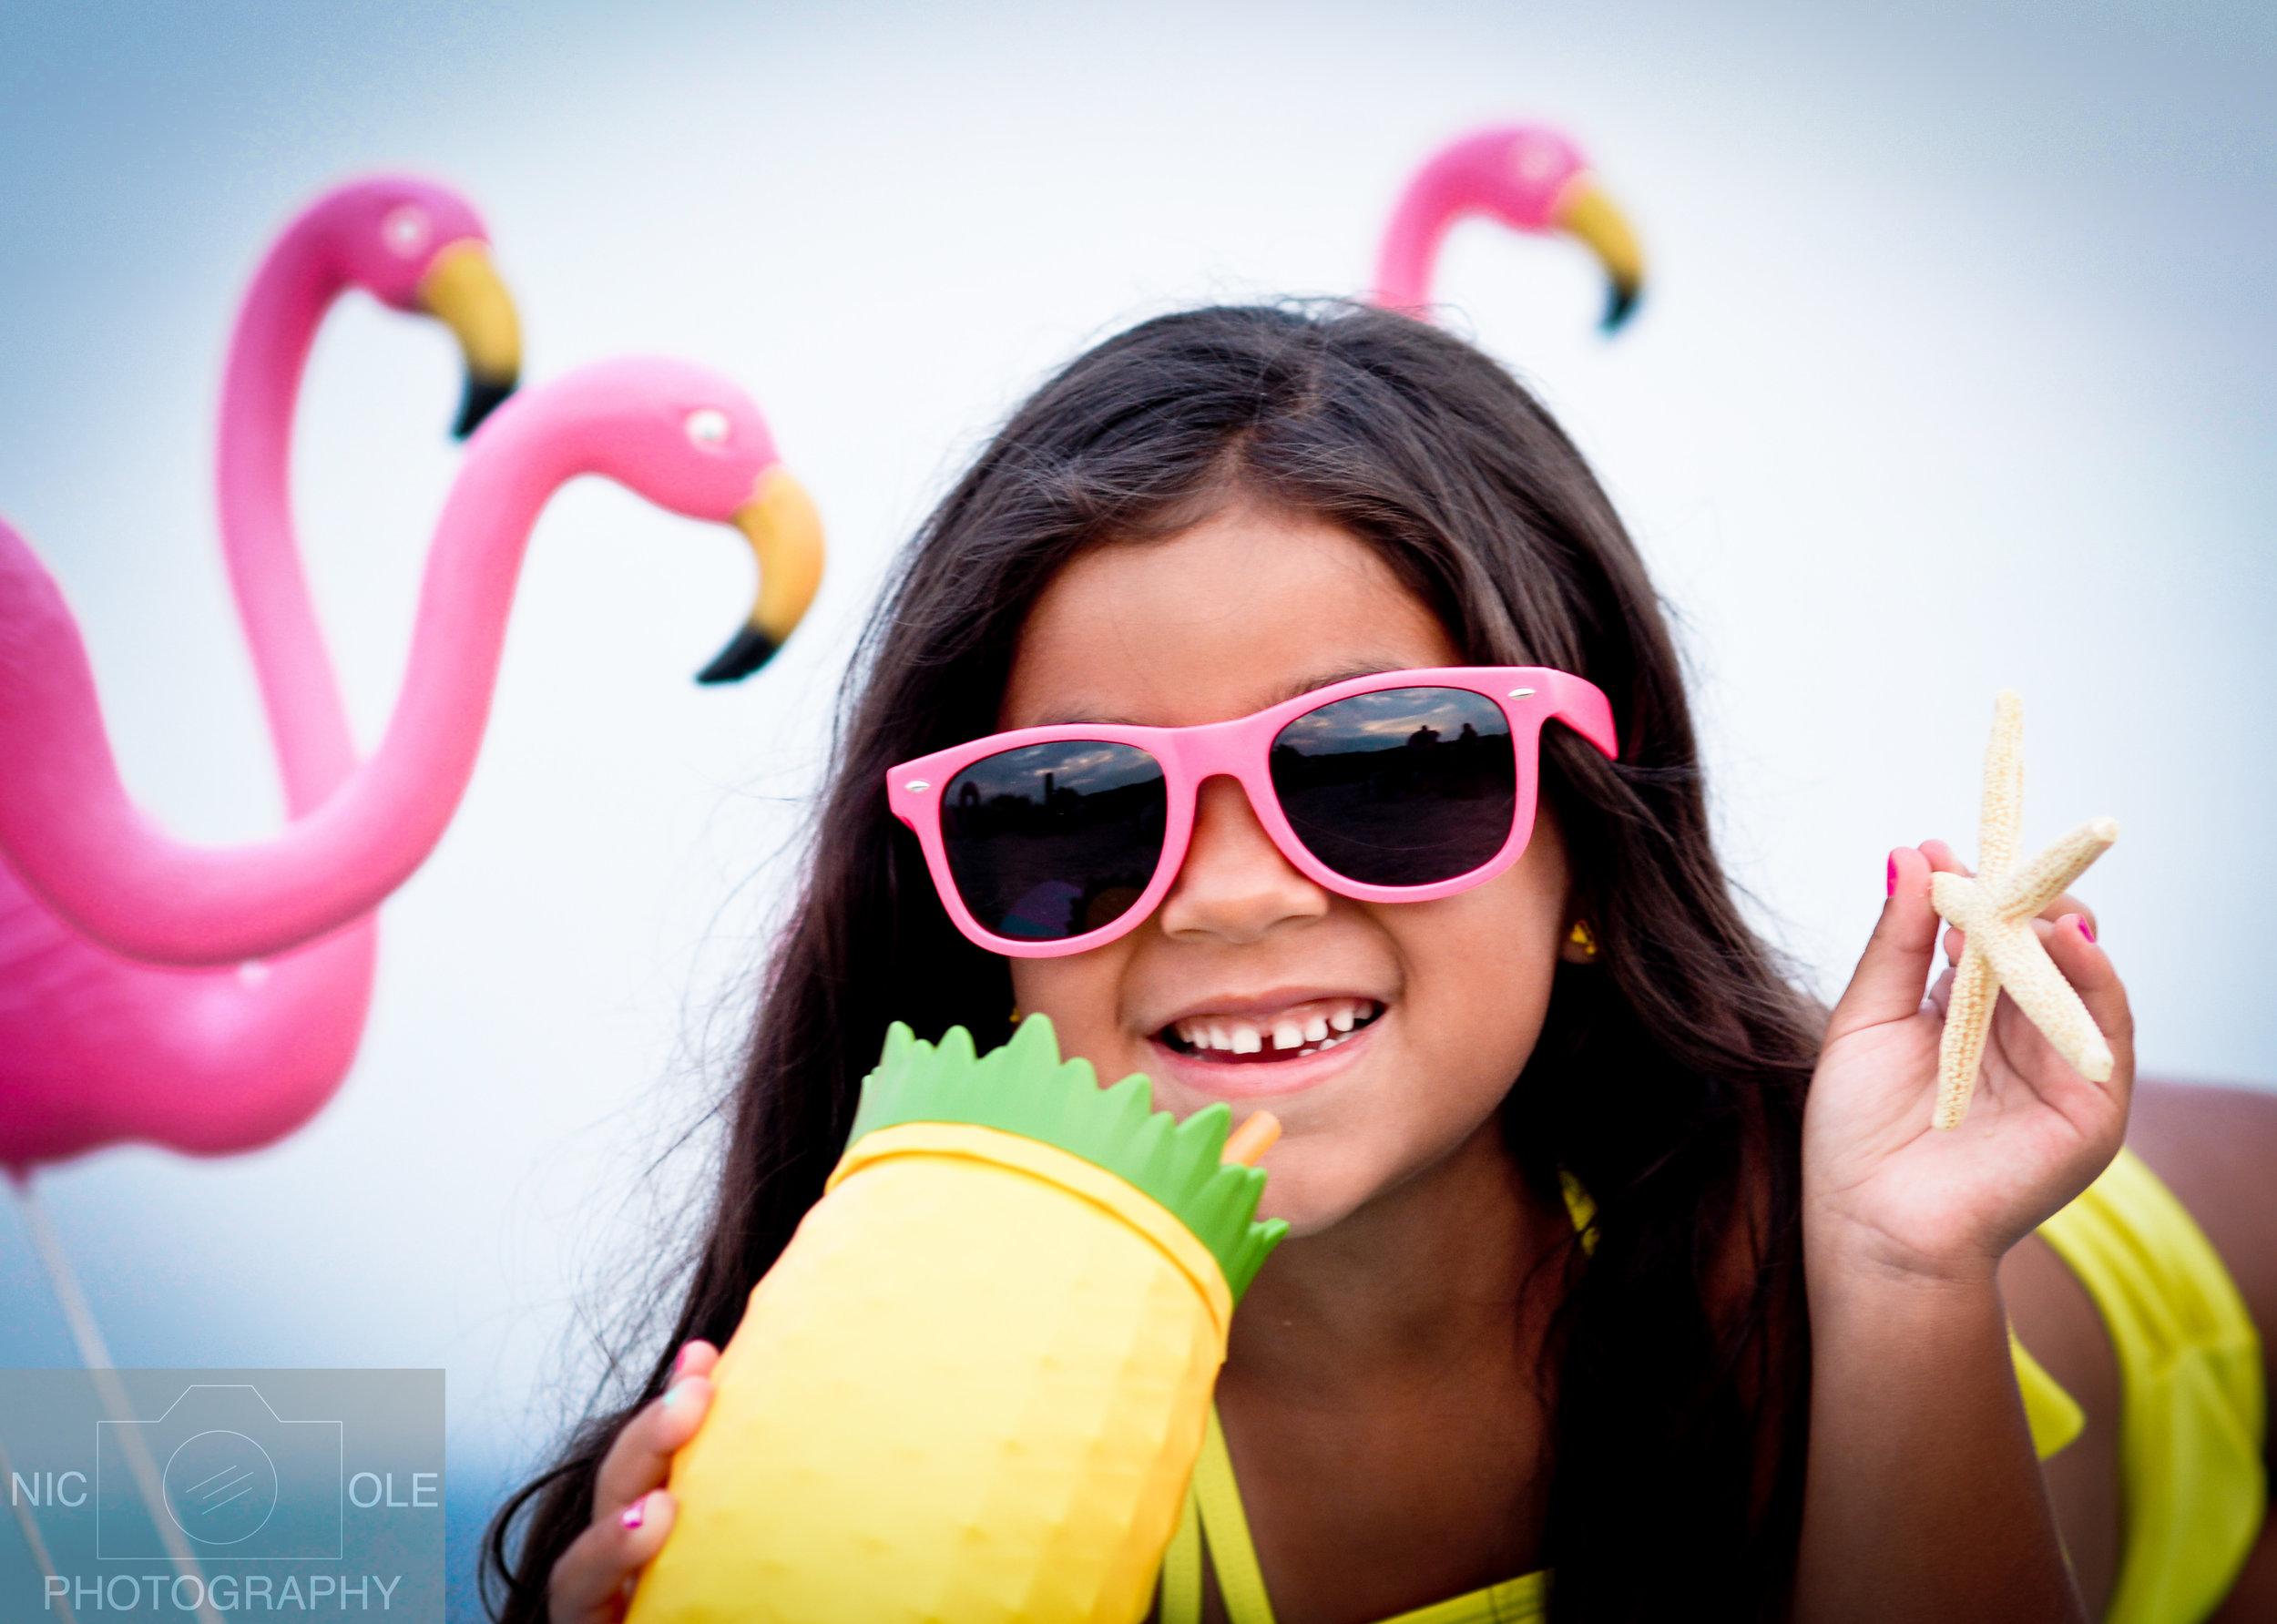 Cielo Noemi Flamingo Beach 7.20.17- NIC-OLE Photography-4.jpg